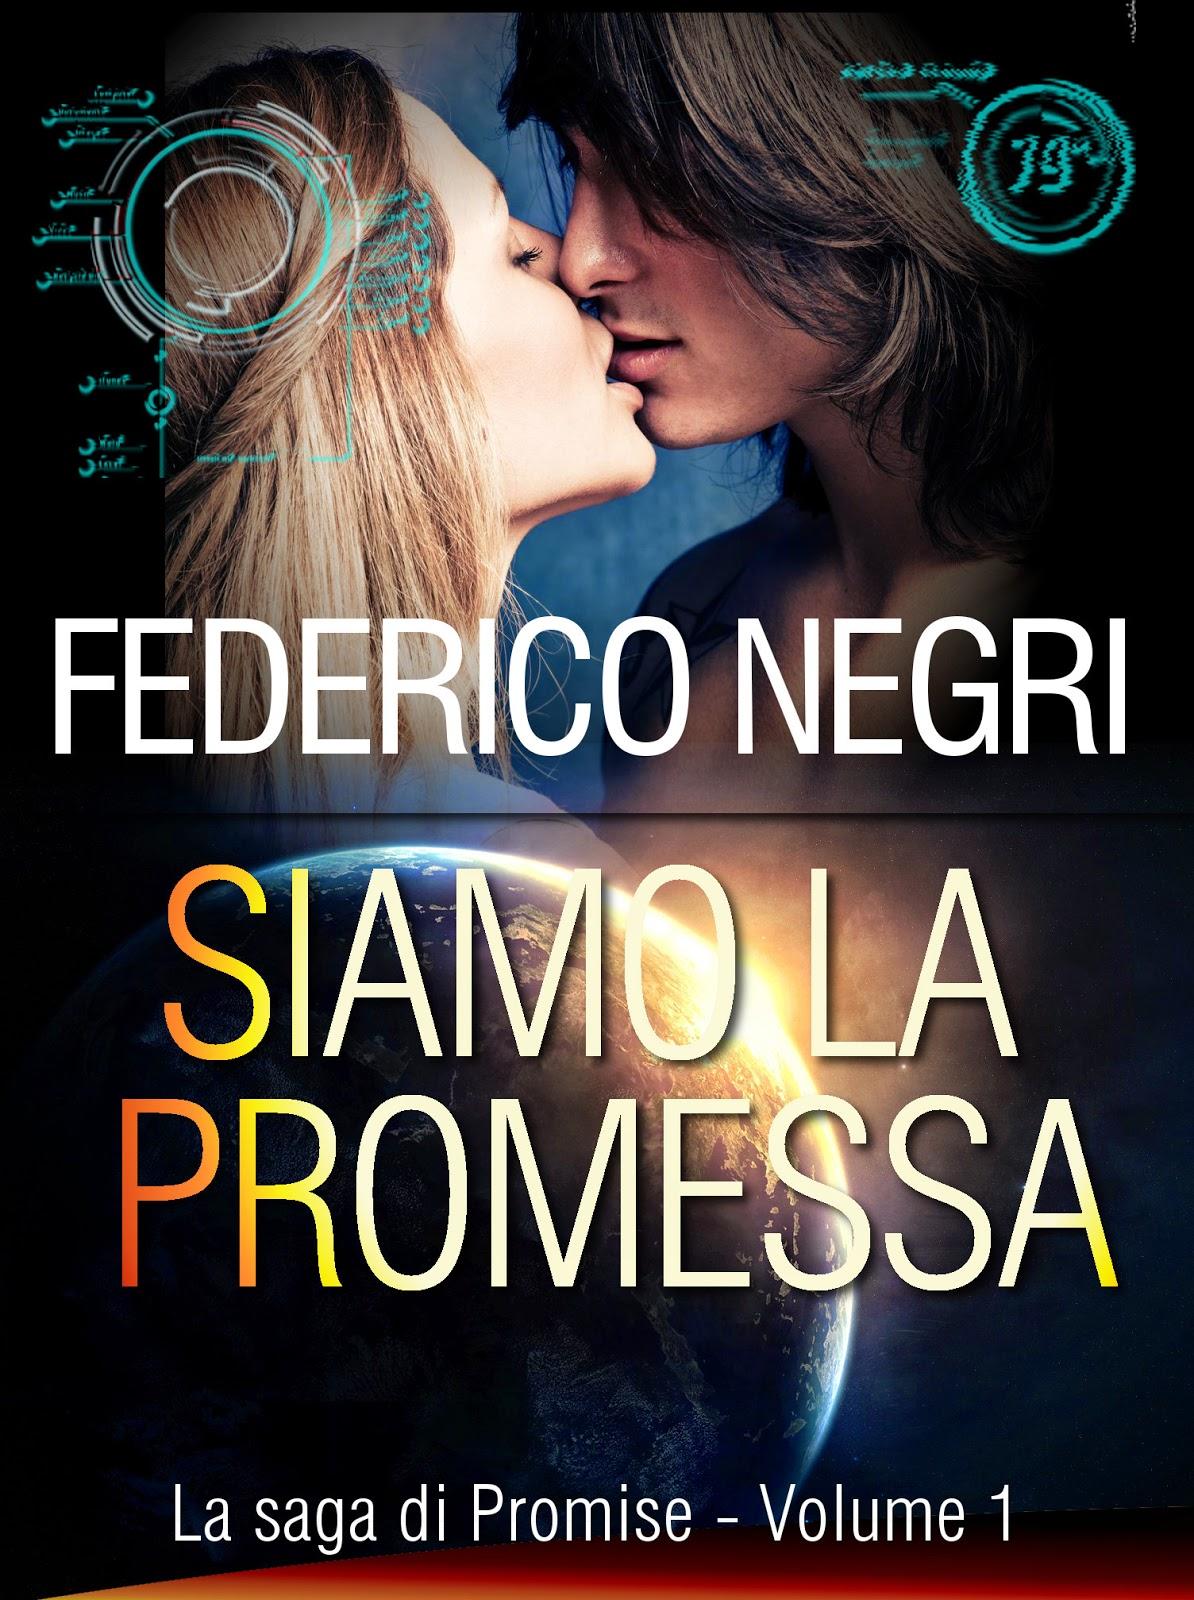 http://www.amazon.it/Siamo-promessa-saga-Promise-Vol-ebook/dp/B00KRGL61Y